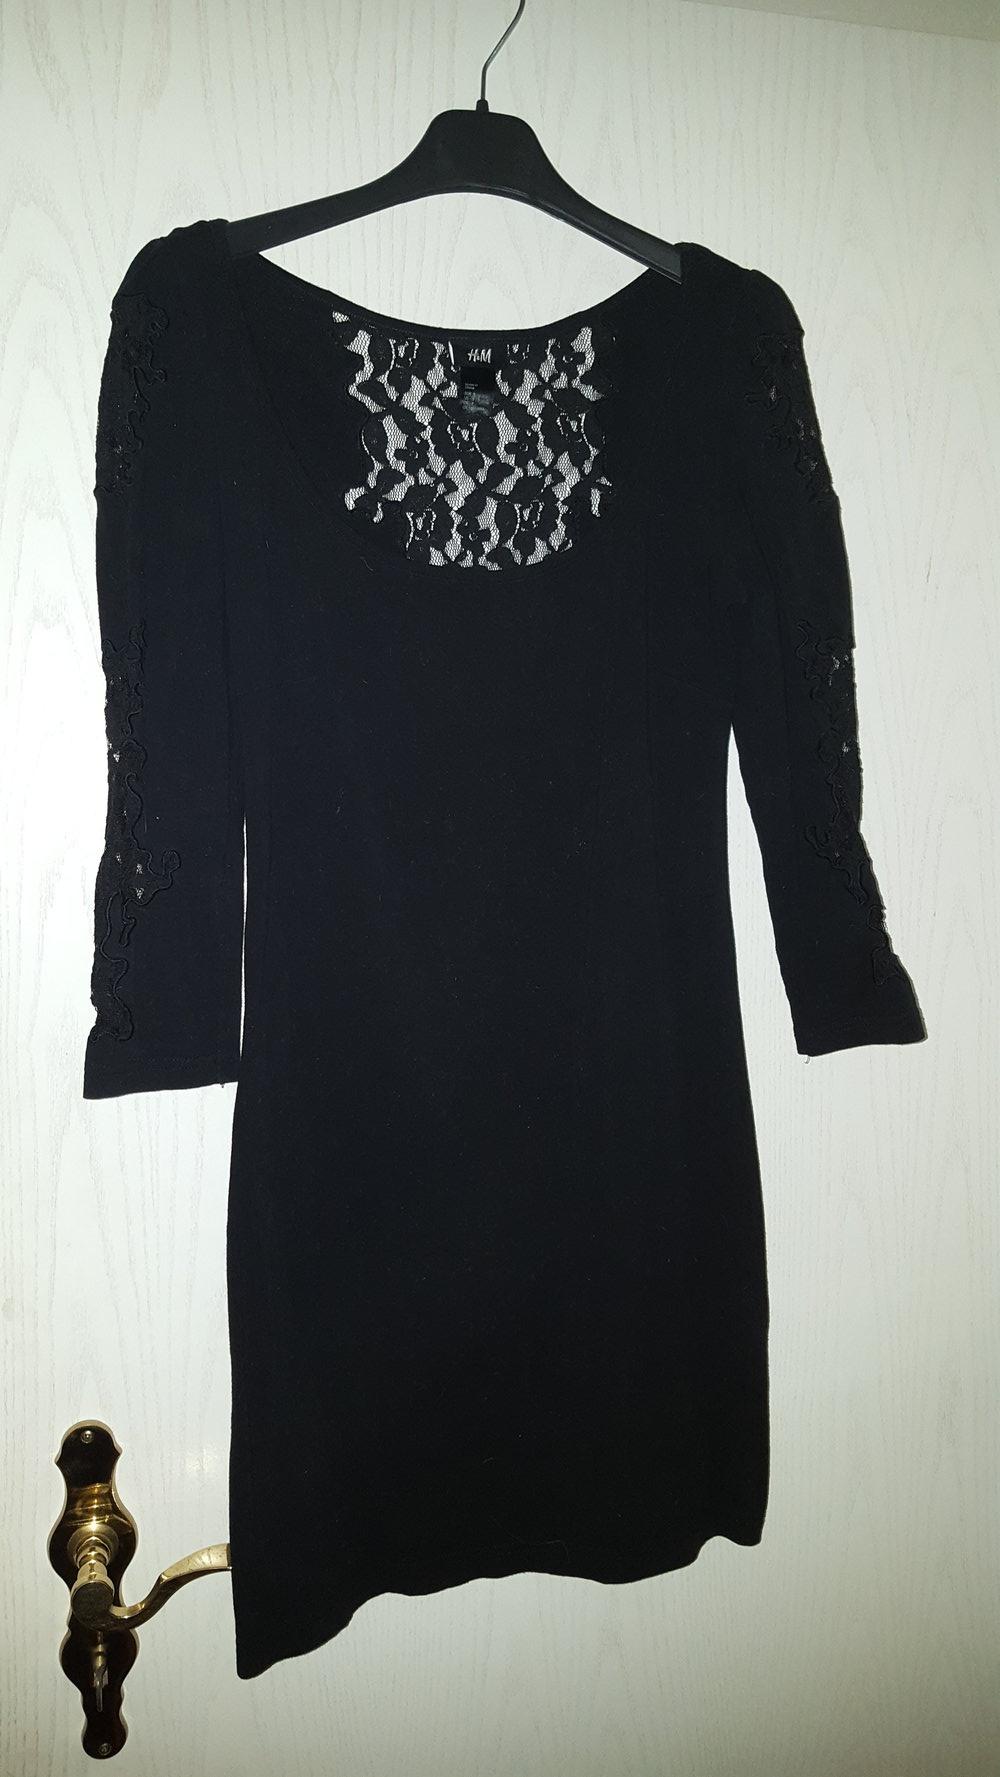 Kleid H&M :: Kleiderkorb.de